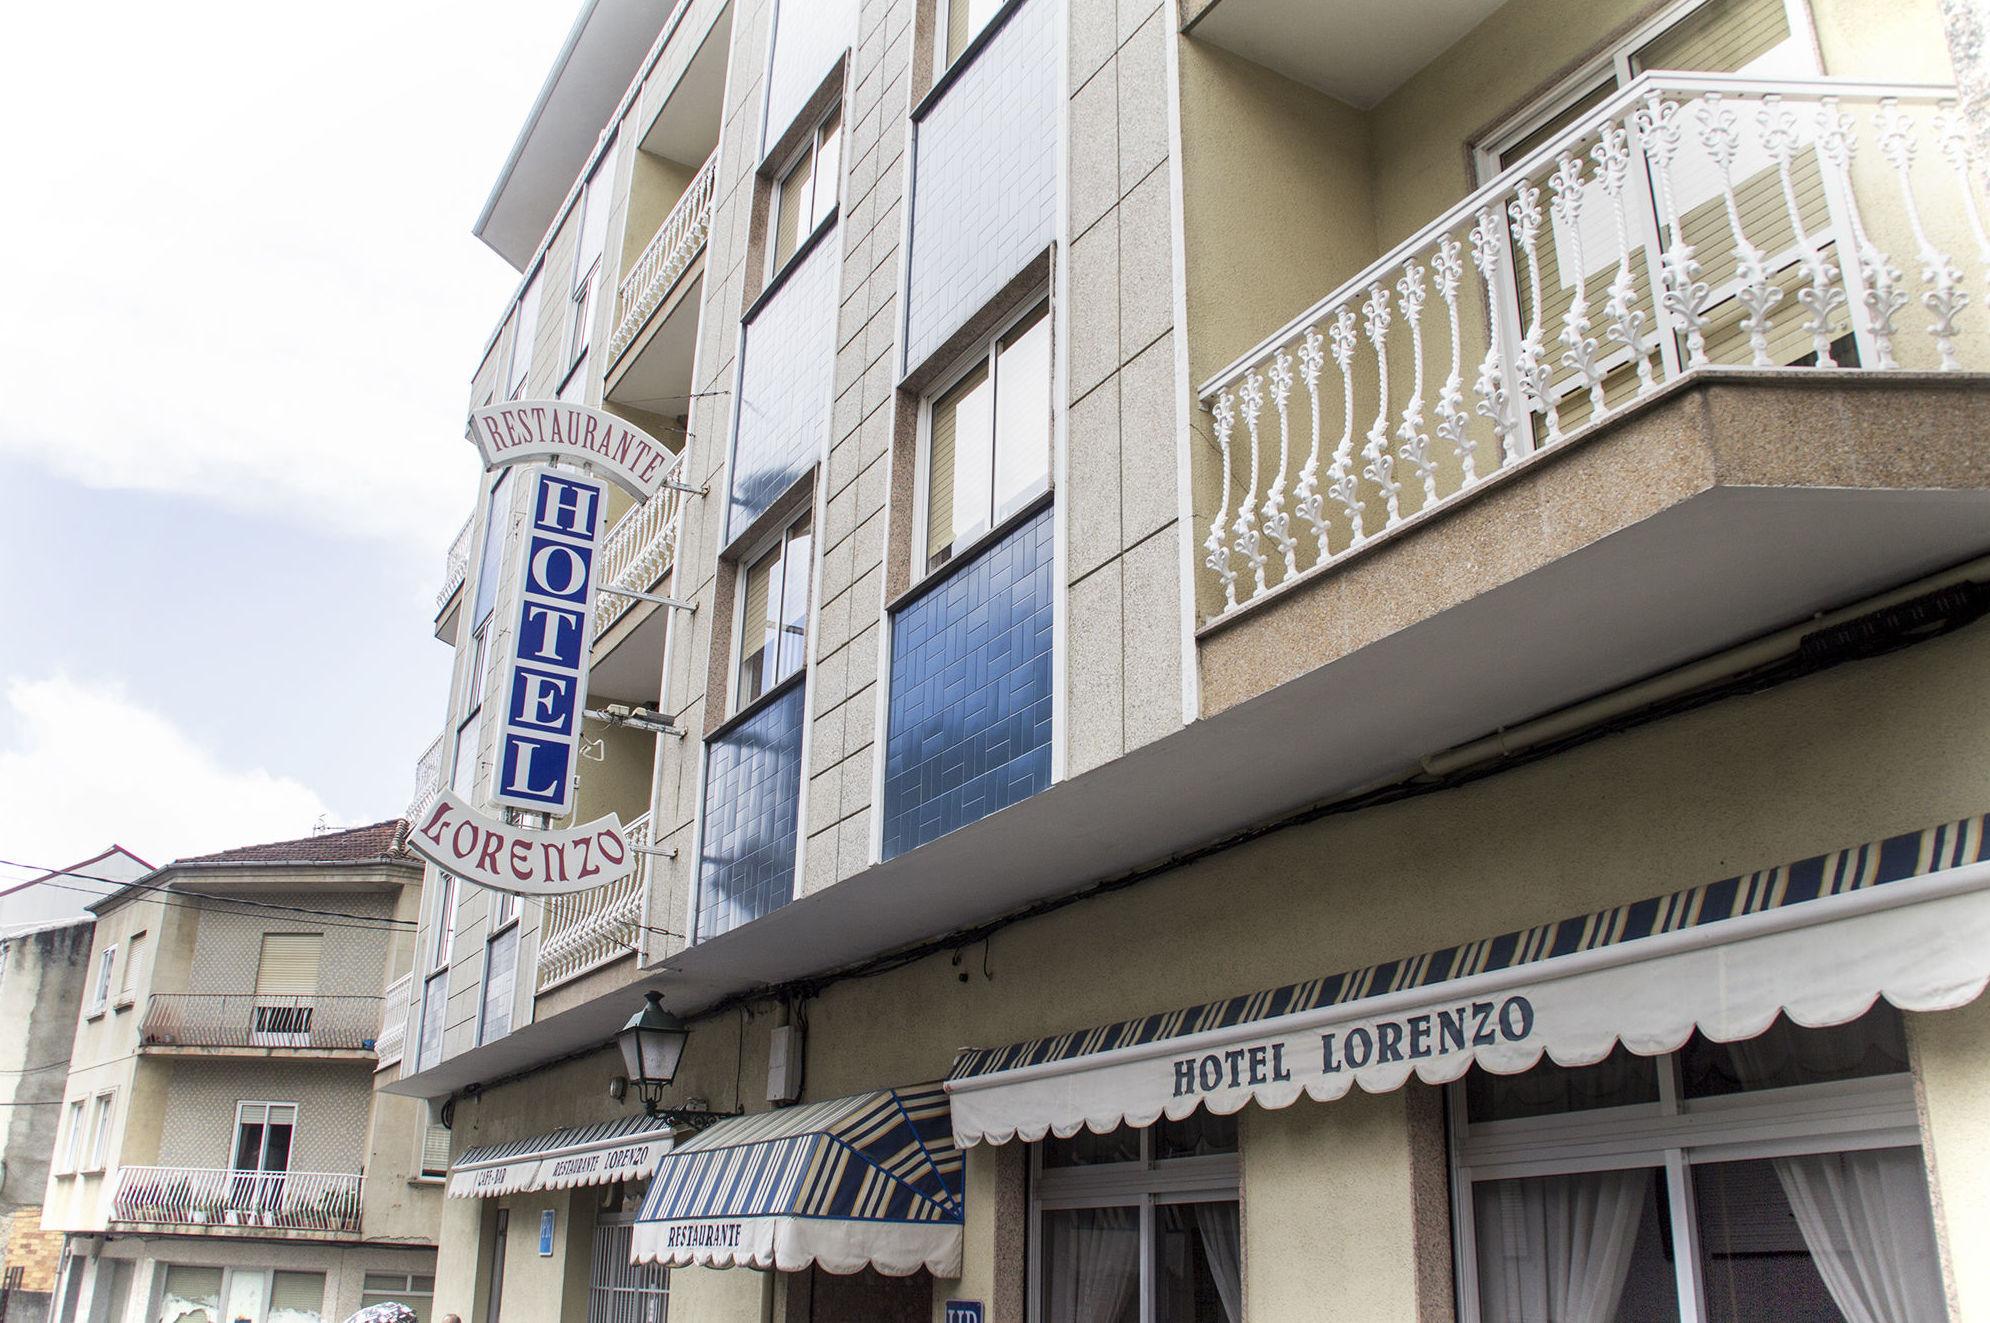 Hotel Lorenzo en O Carballiño, Ourense